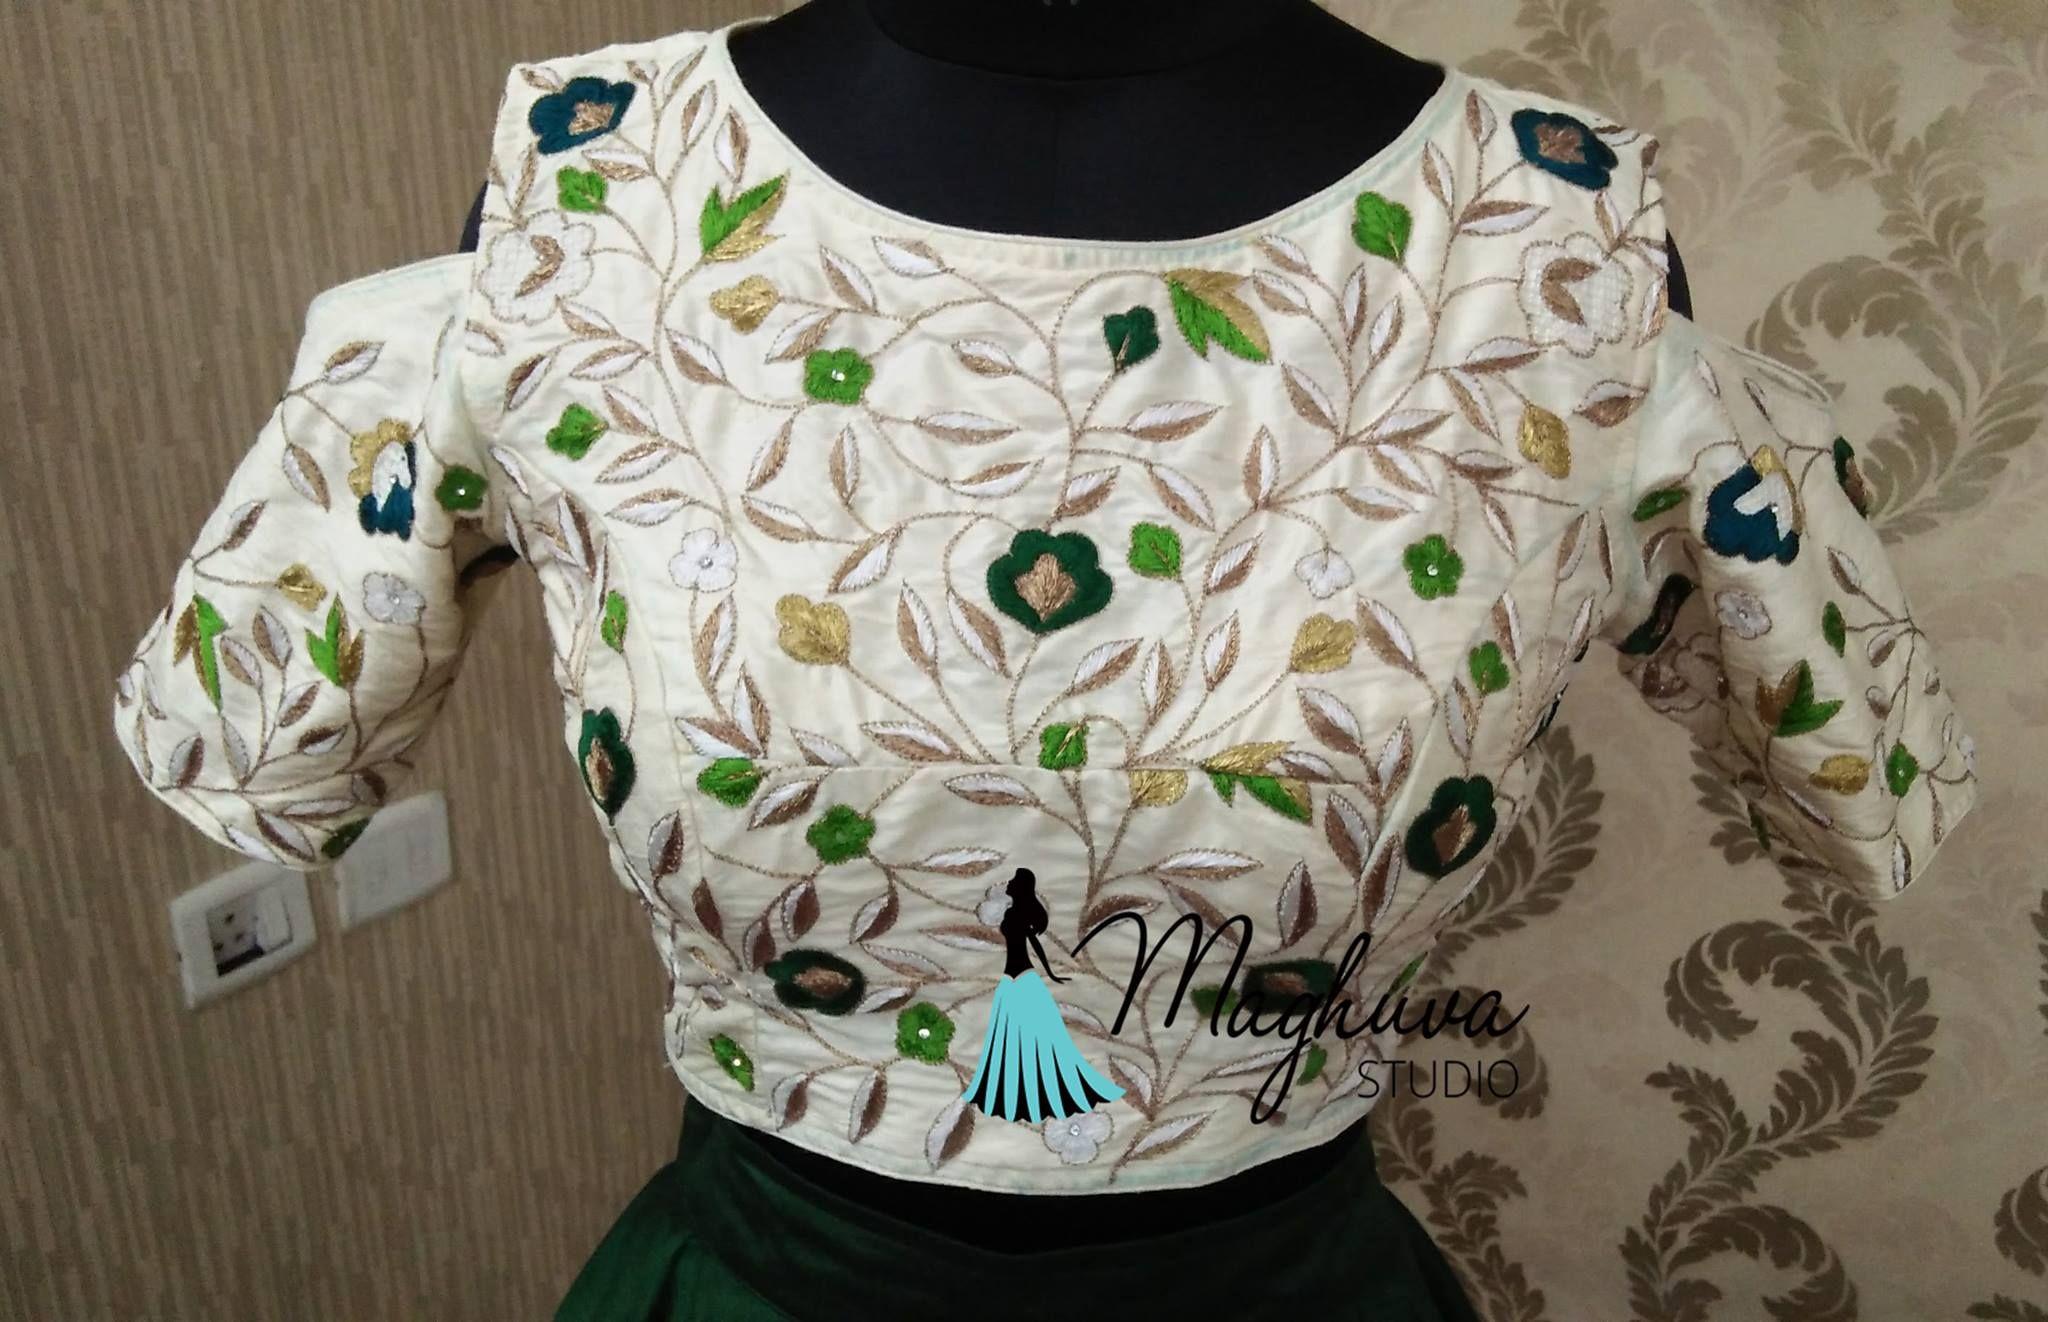 Maghuva Studio Hyderabad Madhapur Contact 0091 9052427799 Blouse Designs Latest Blouse Designs Work Blouse